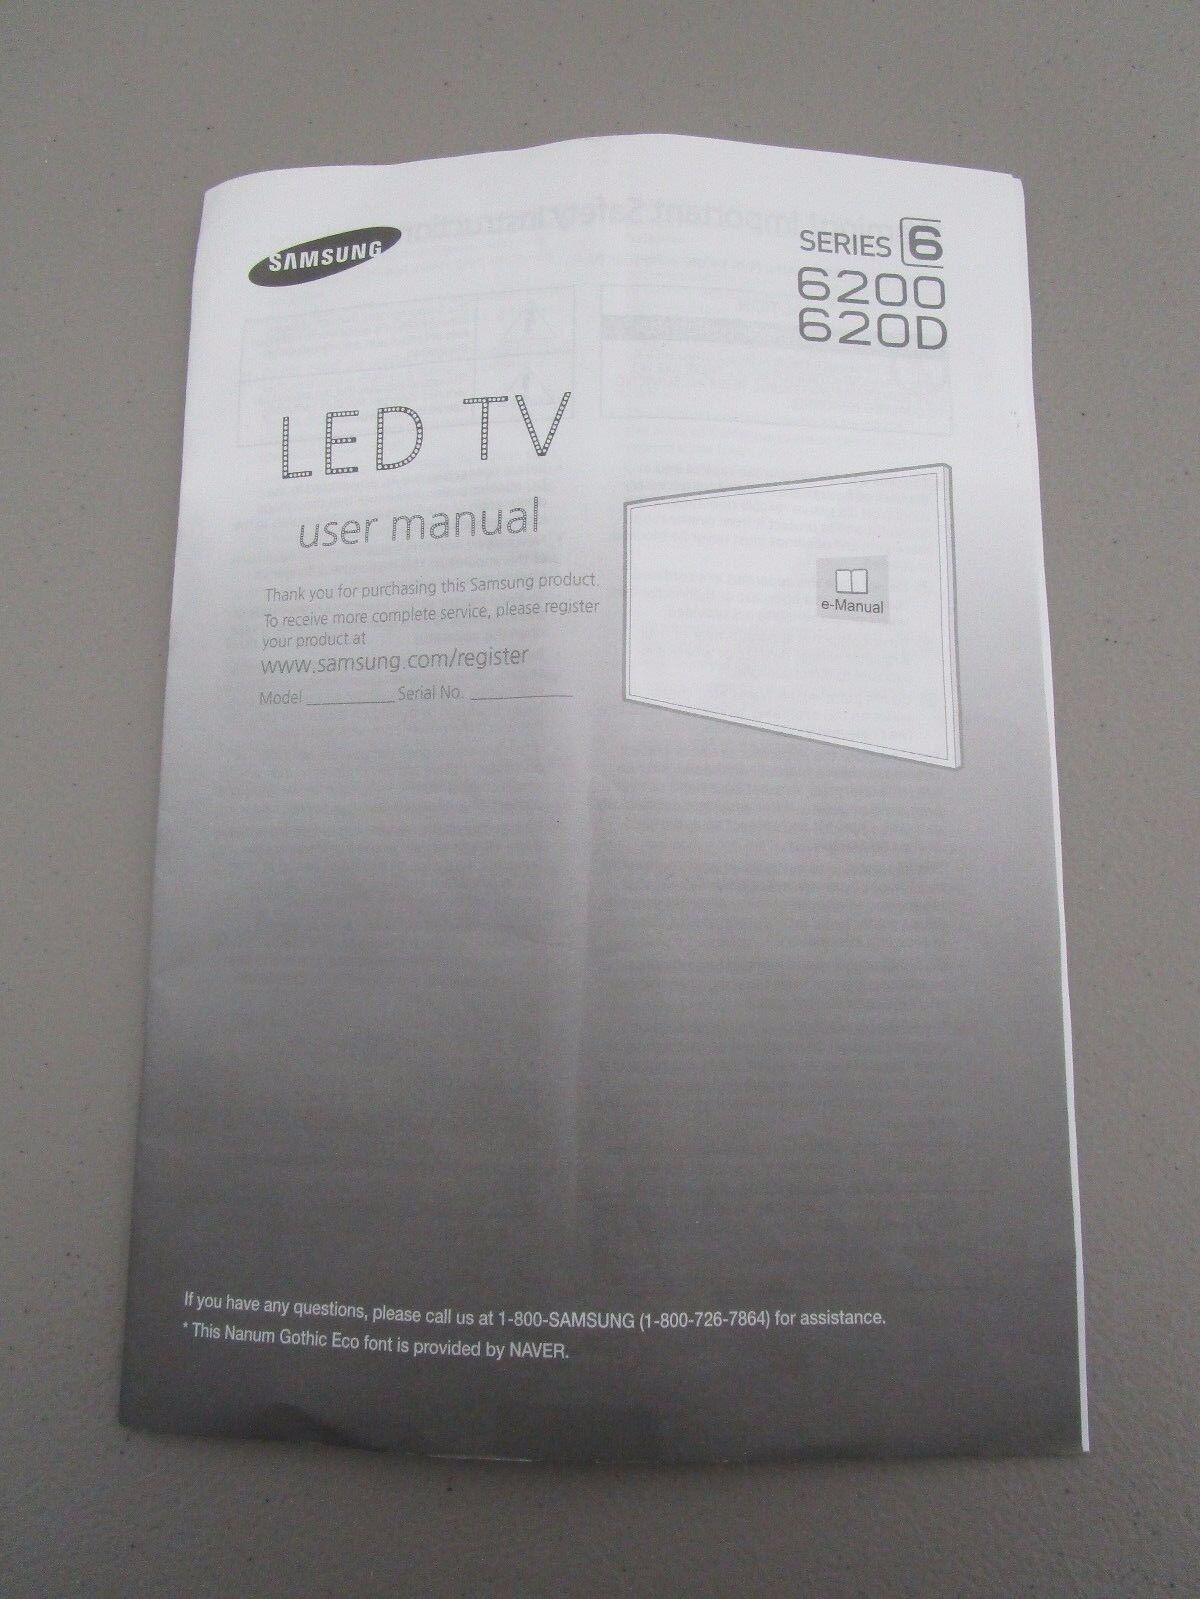 SAMSUNG LED TV SERIES 6 6200 620D USER MANUAL NEW